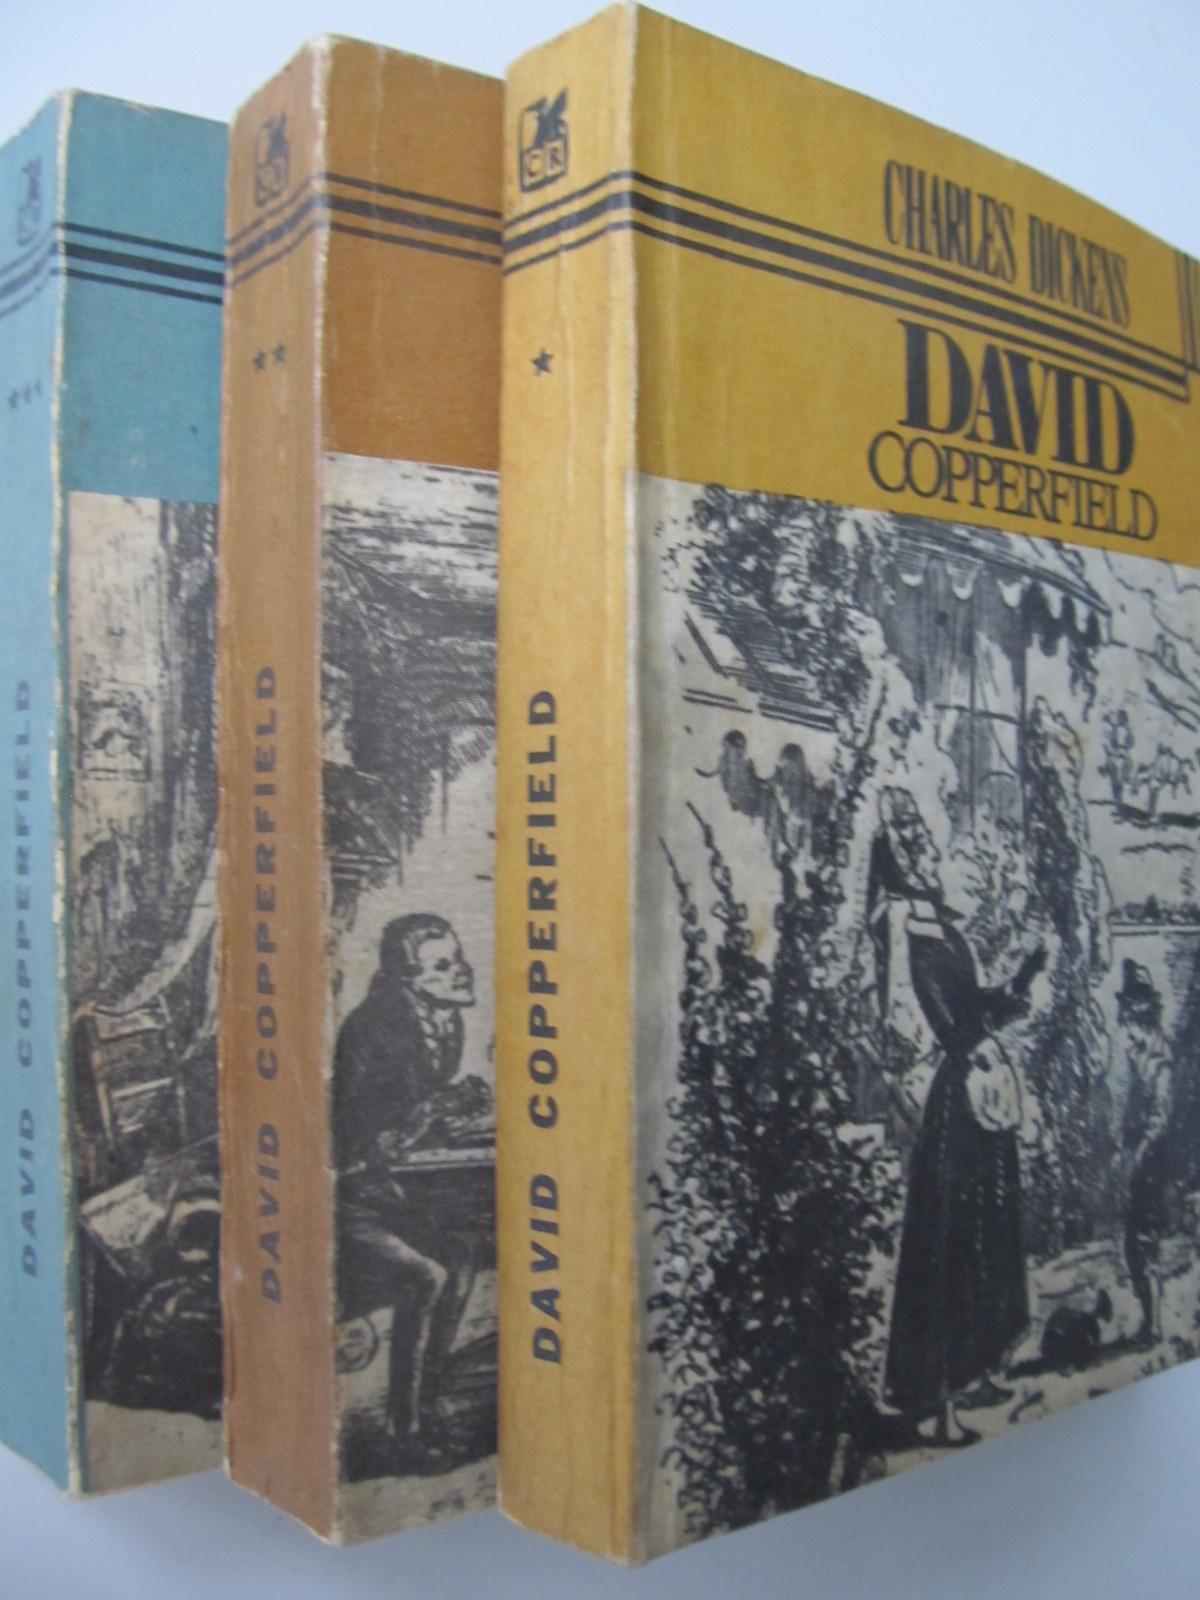 David Copperfield (3 vol.) - Charles Diickens | Detalii carte